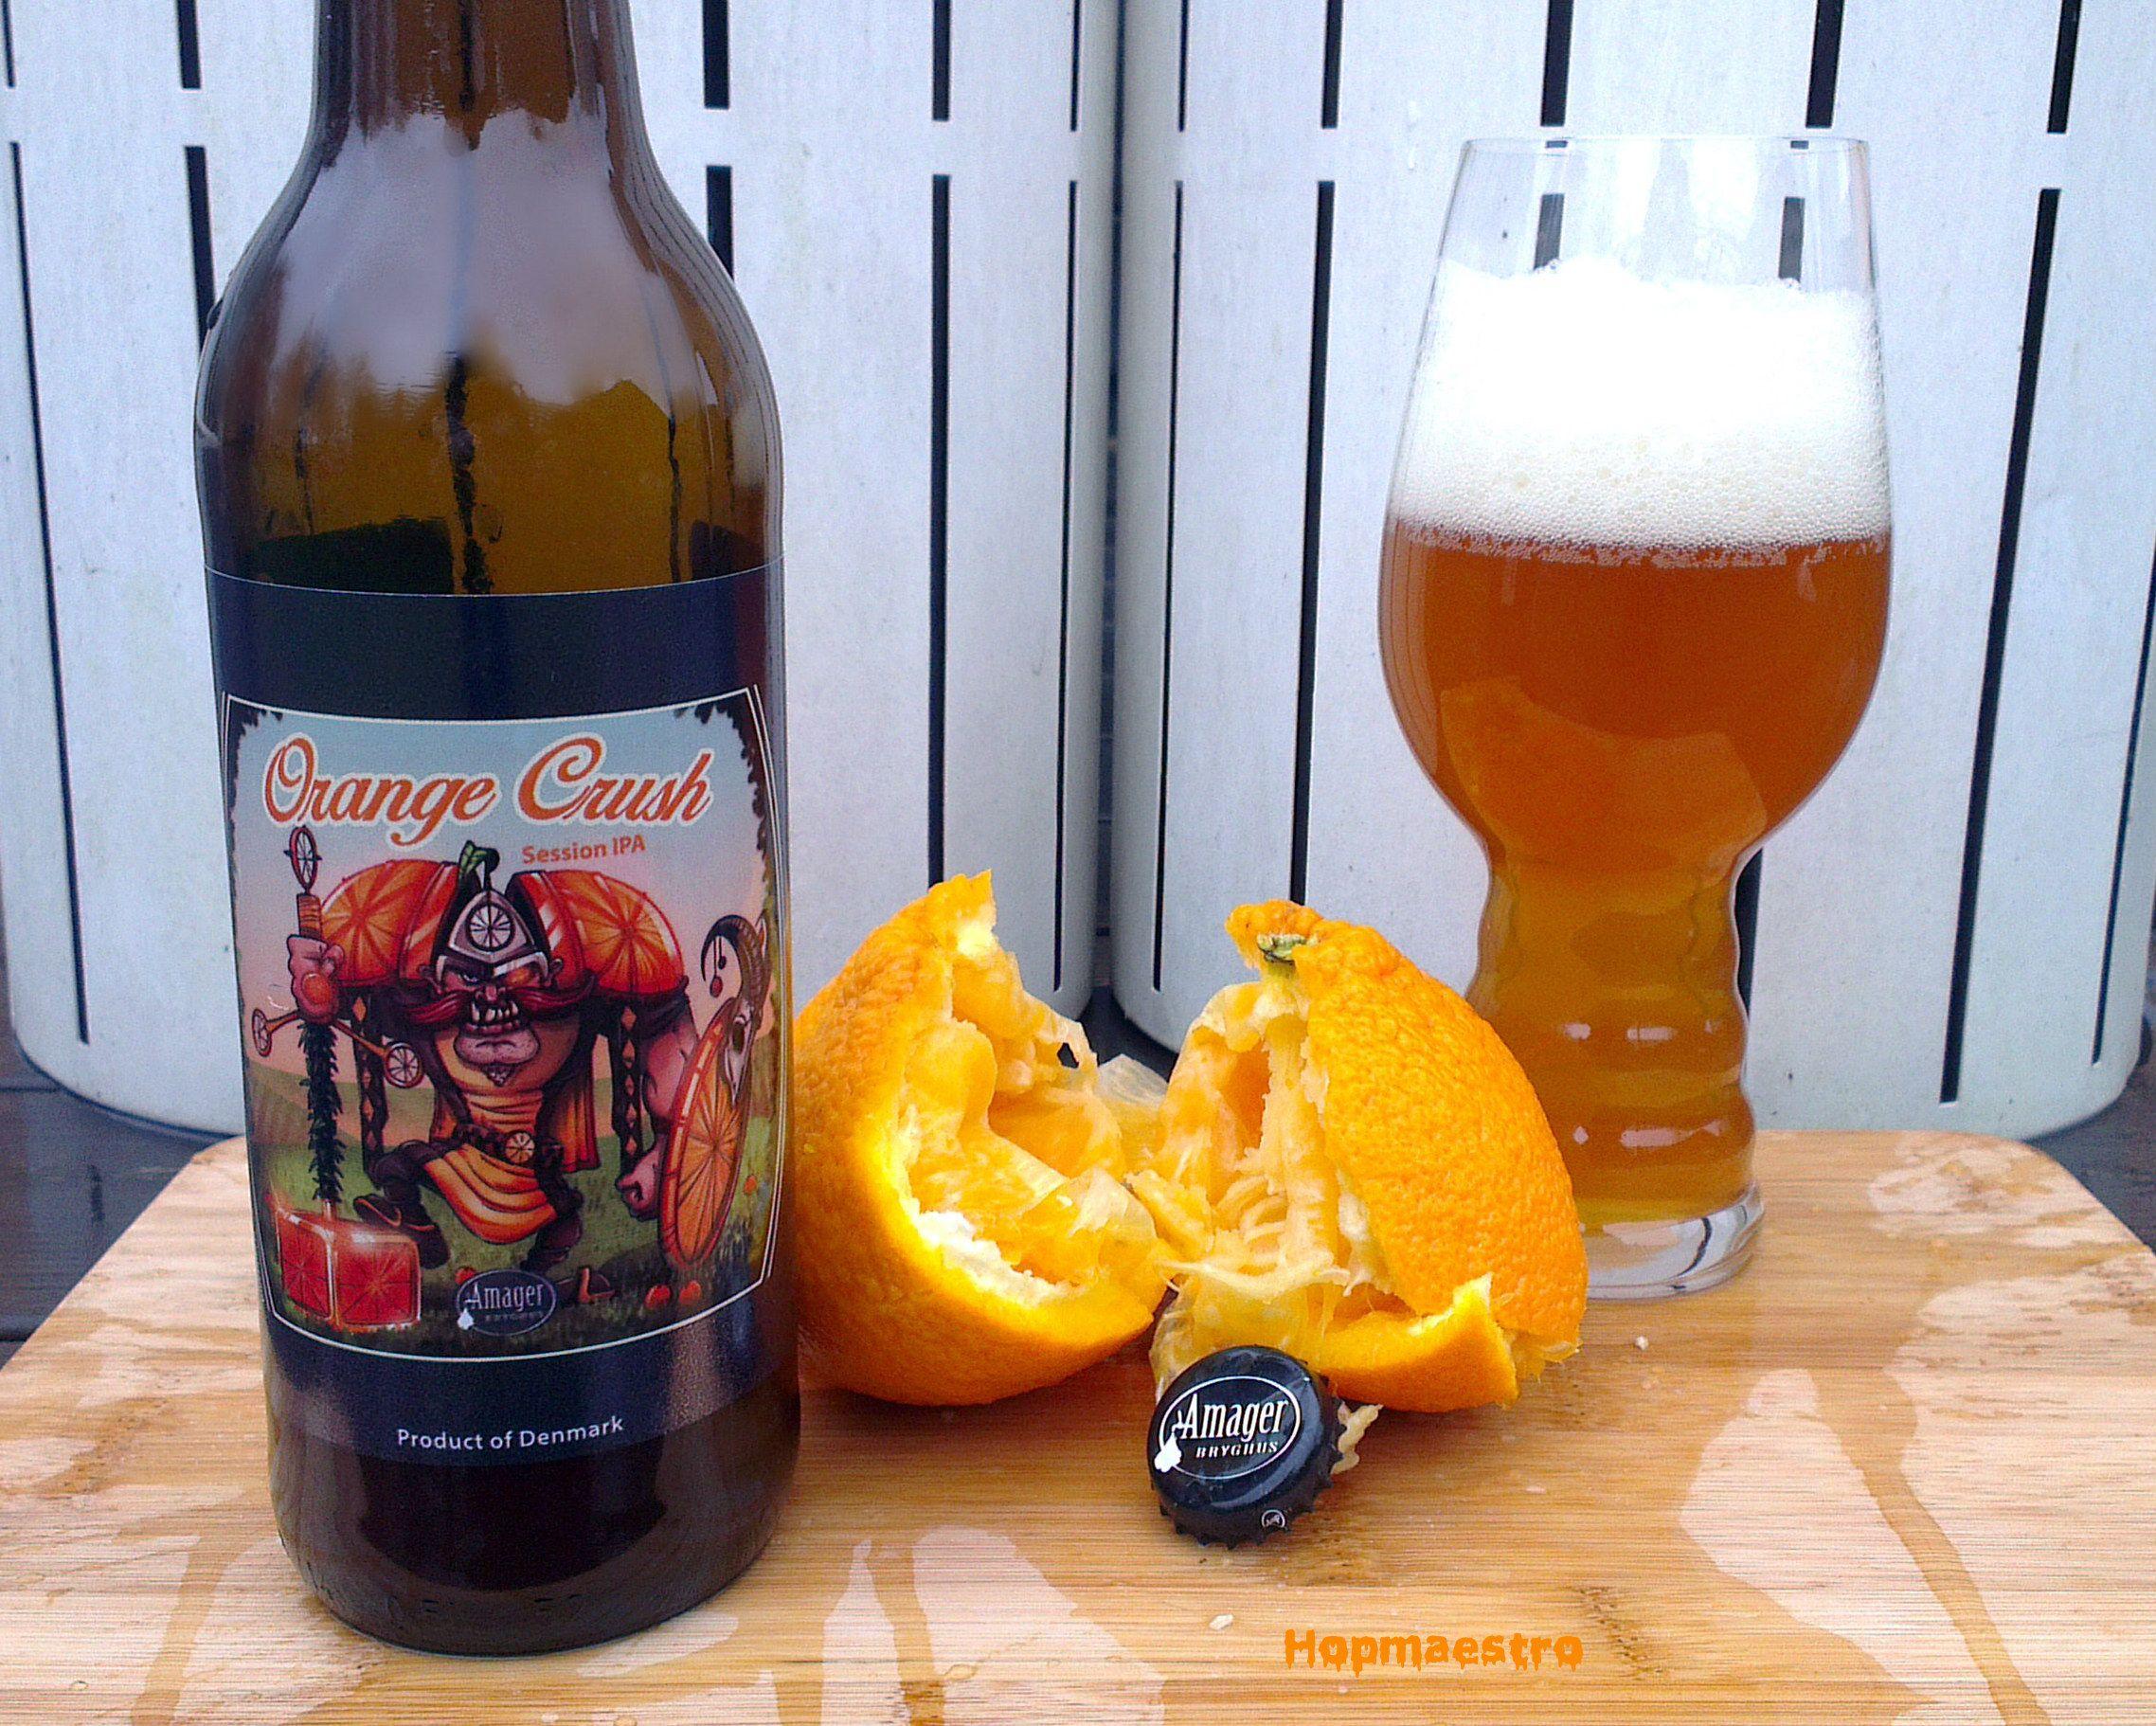 Amager/Cigar City Orange Crush (Session IPA) -- Appearance: Hazy amber/orange colour with an off-white head. Aroma: Citrus, grapefruit, oranges, caramel. Body: Medium body and carbonation. Flavour: Grapefruit, grass, fruit, oranges, floral.